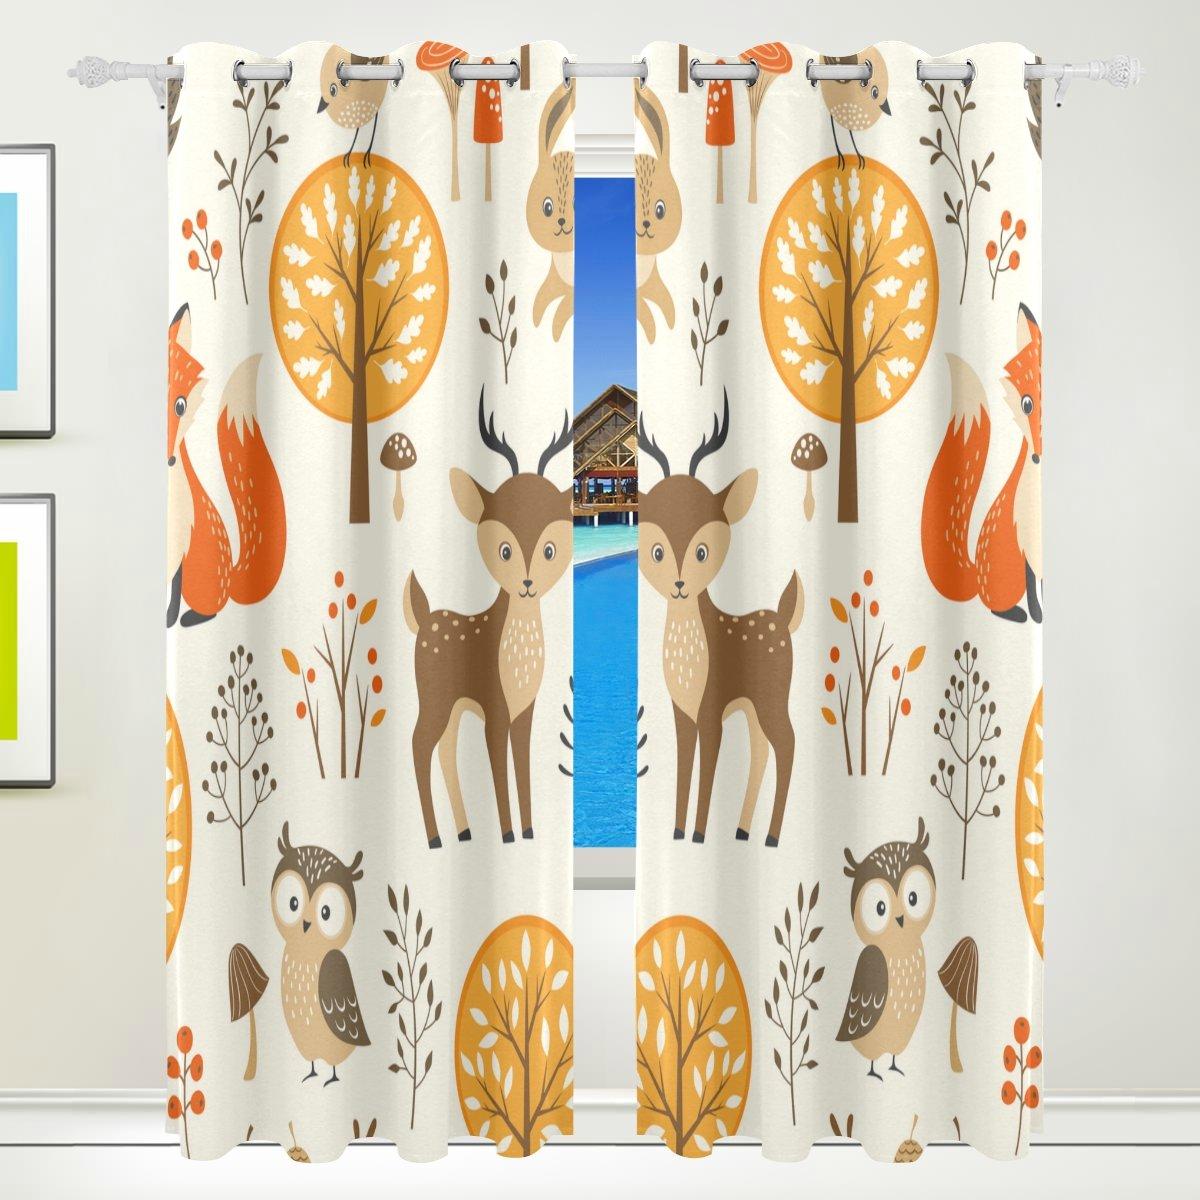 Vantaso Window Curtains 84 Inch Long Cute Forest Animal Owls Fox Deer for Kids Girls Boys Bedroom Living Room Polyester 2 Pannels